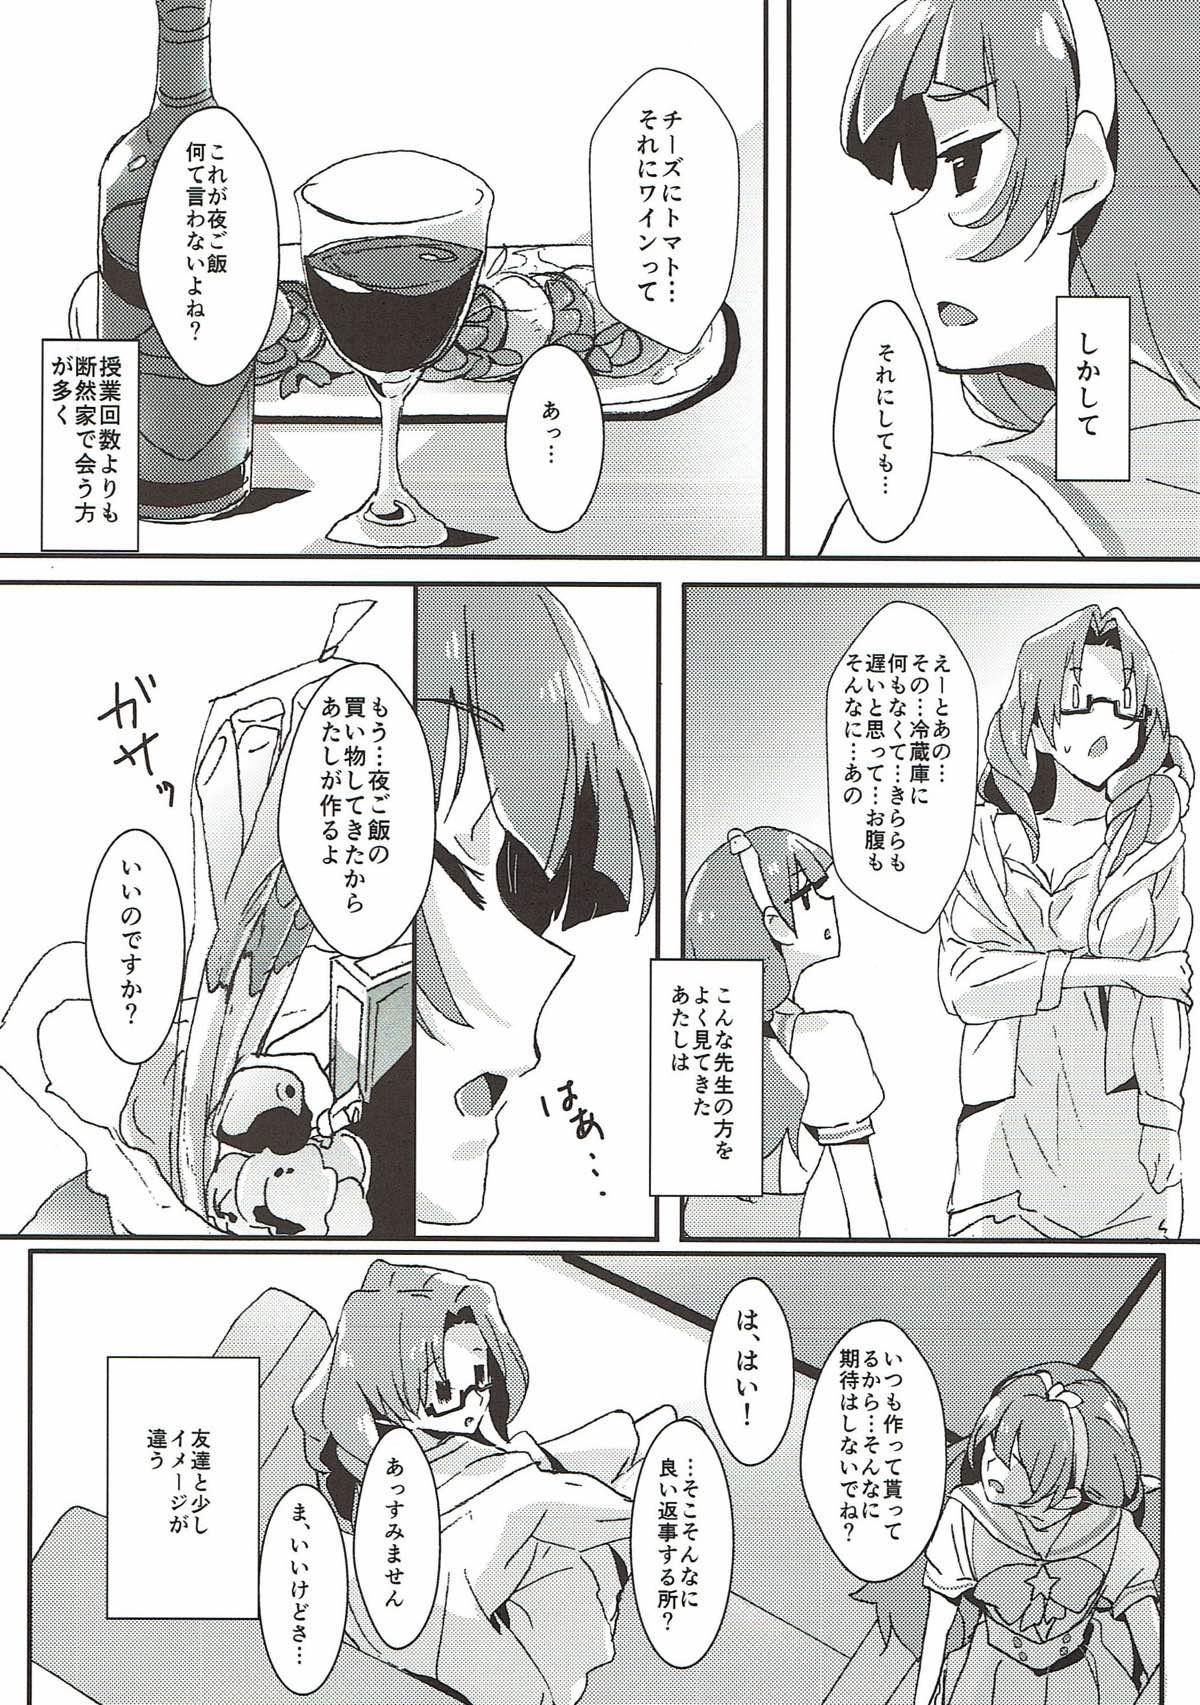 Sensei to Atashi 18